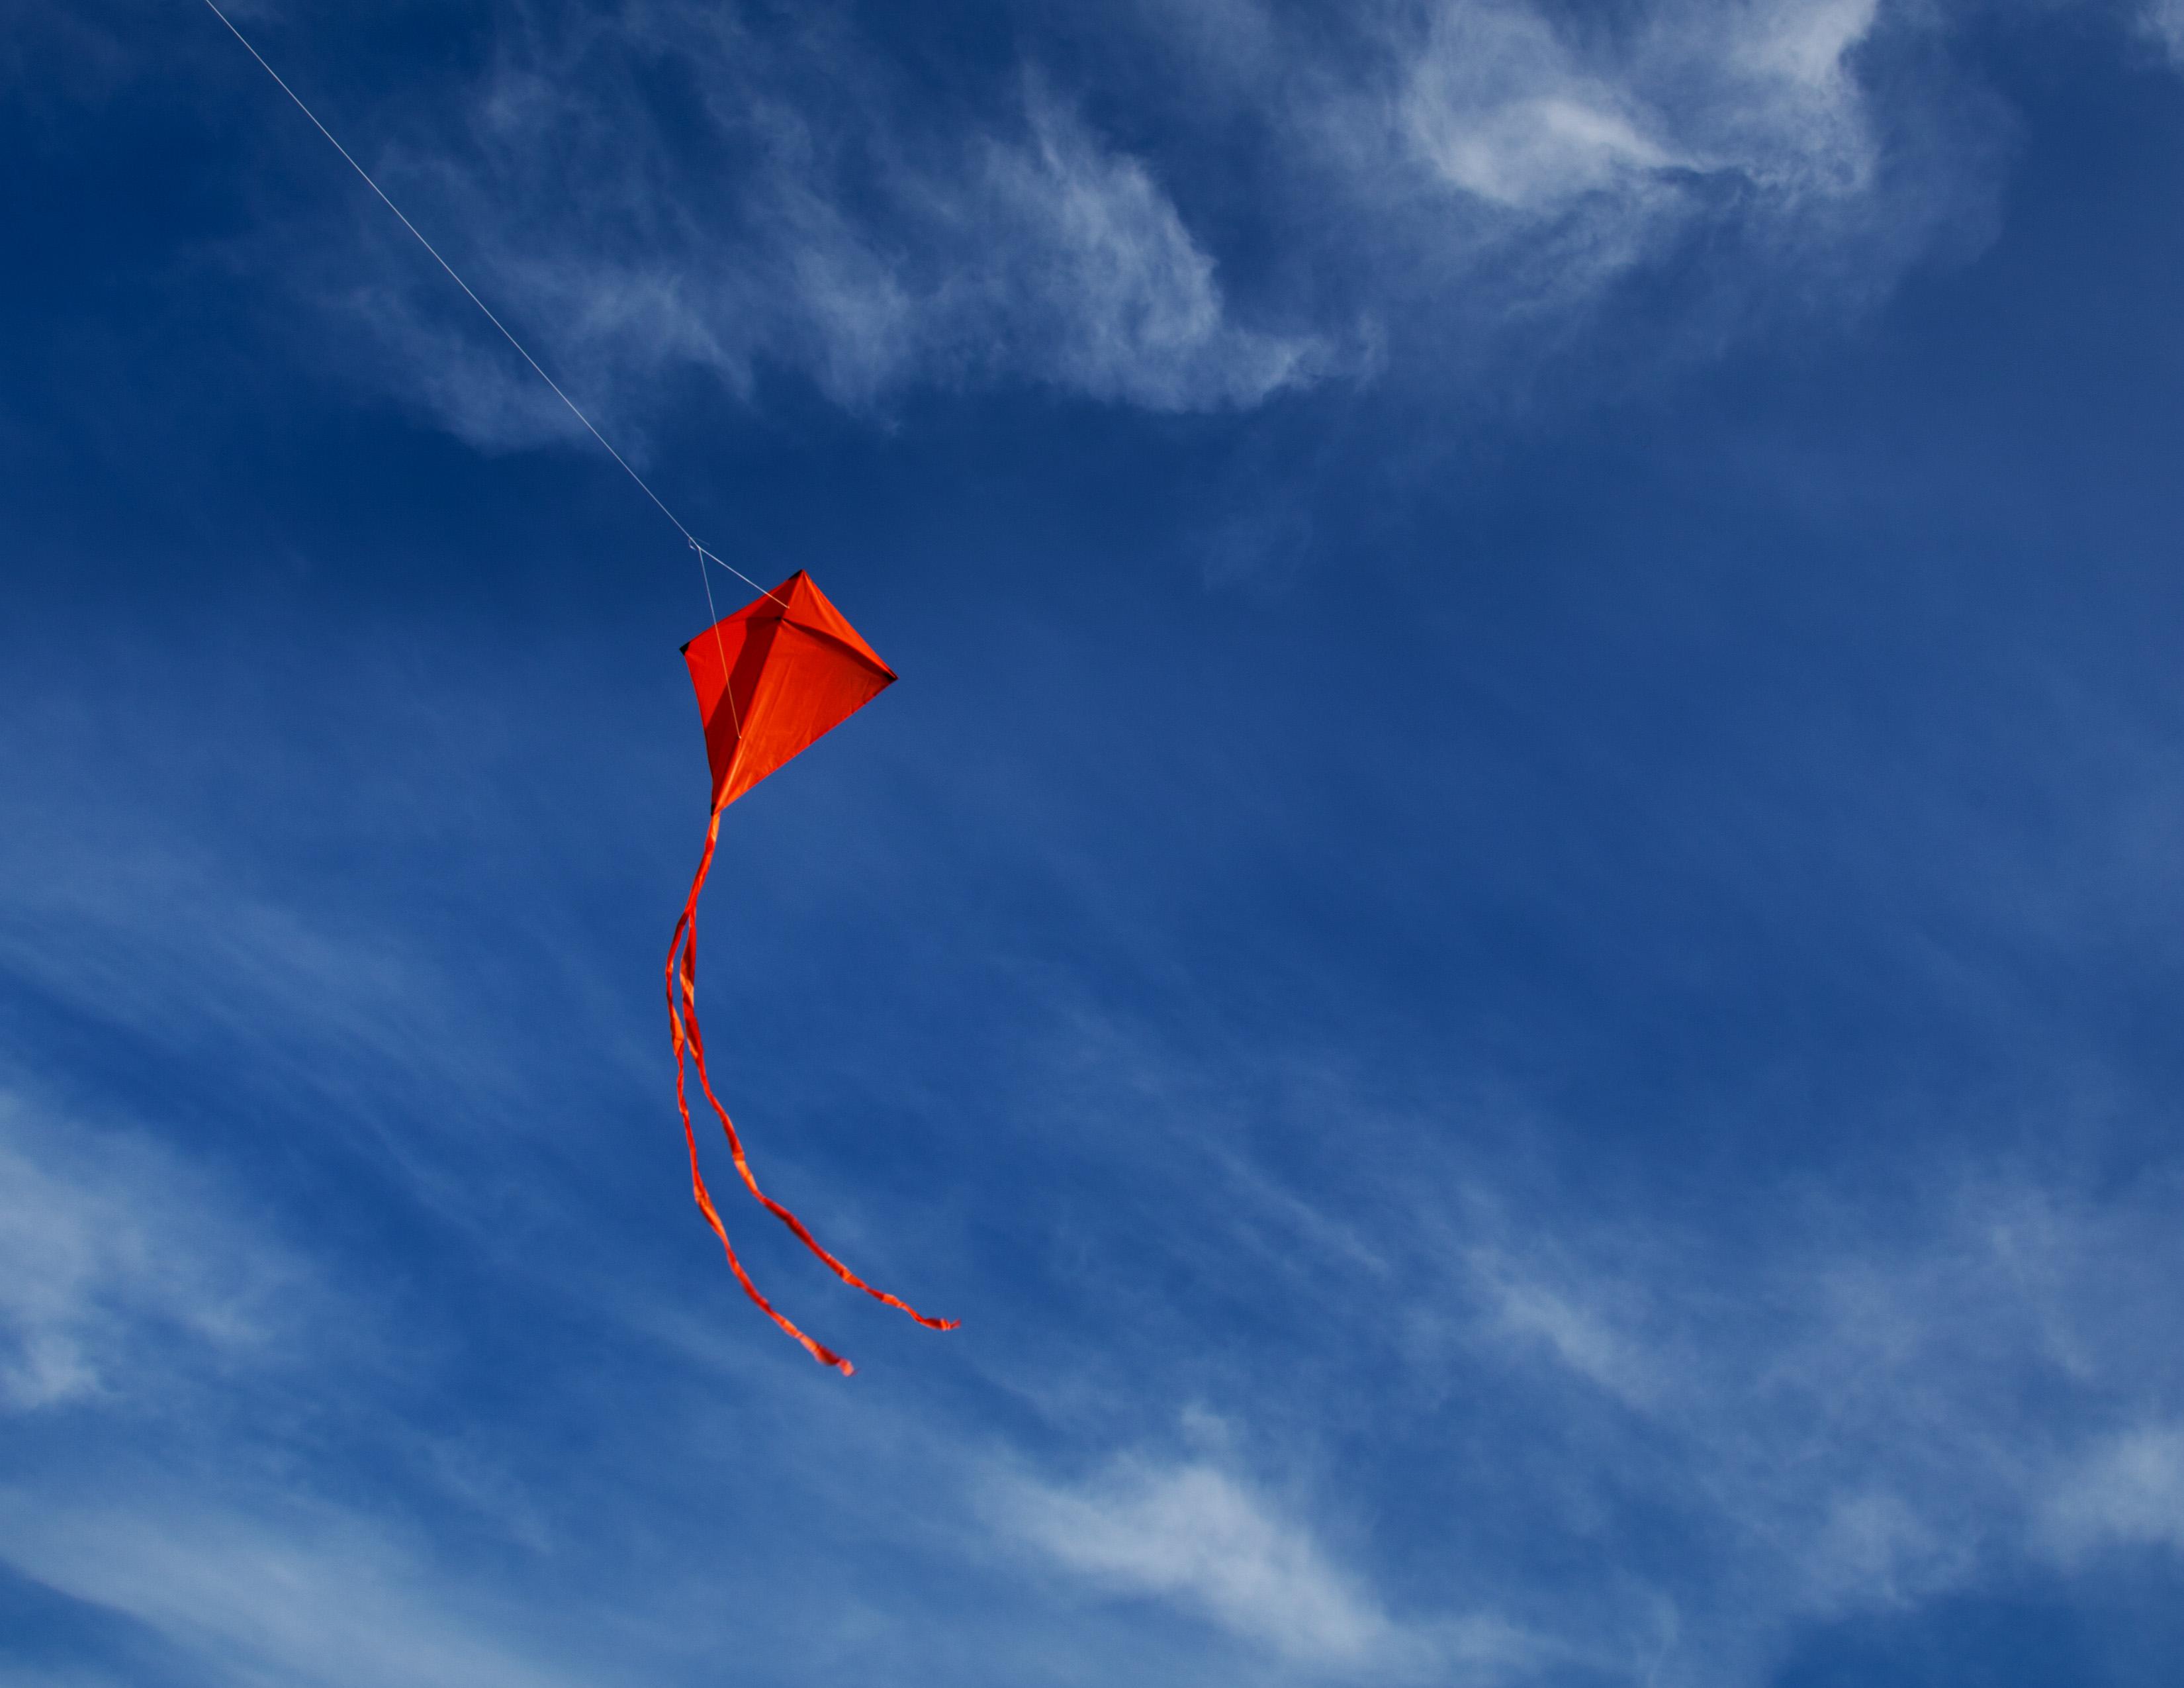 хозяин картинка облака небо воздушный змей наша